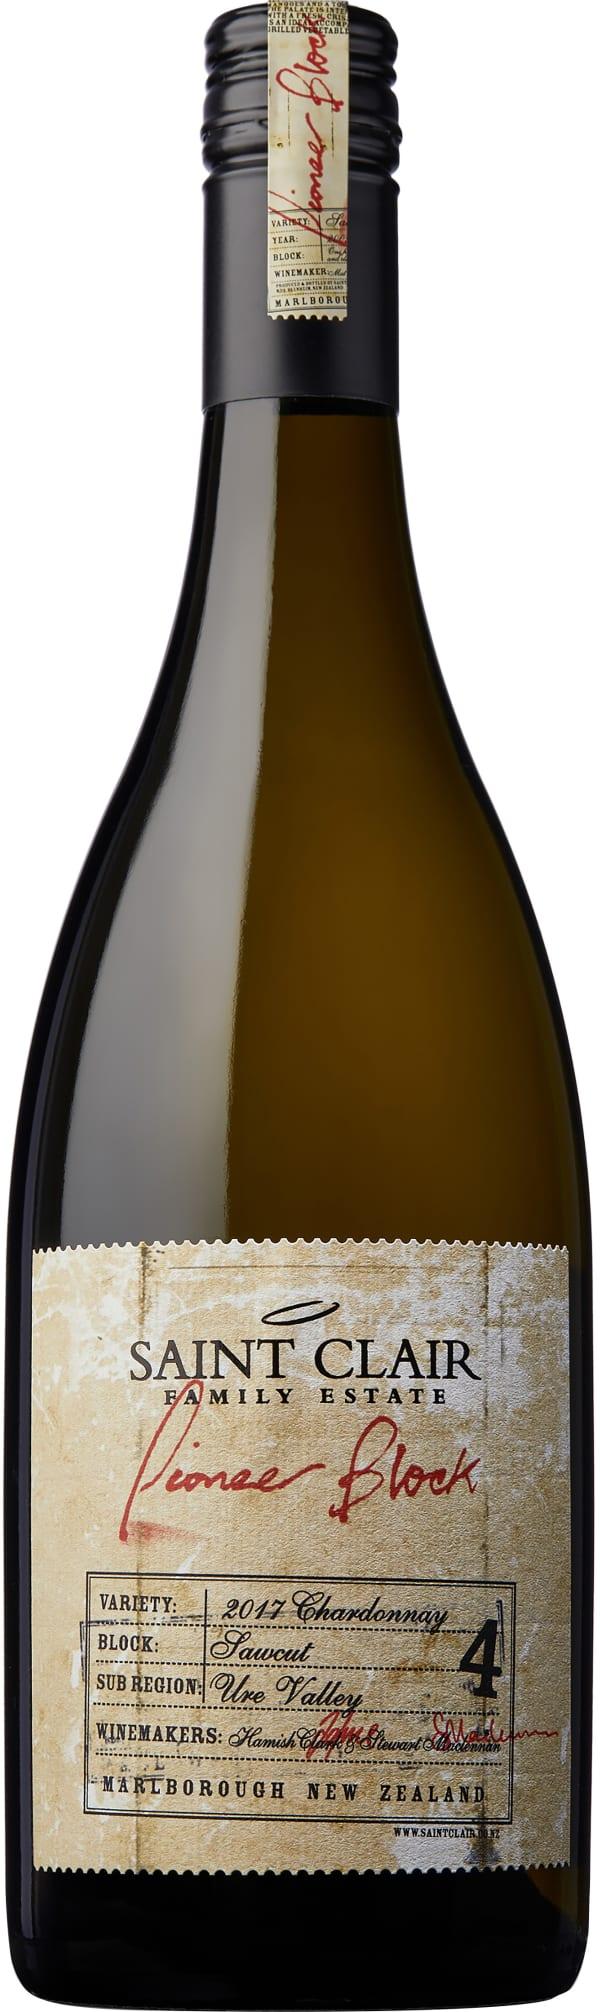 Saint Clair Pioneer Block Sawcut Chardonnay 2015